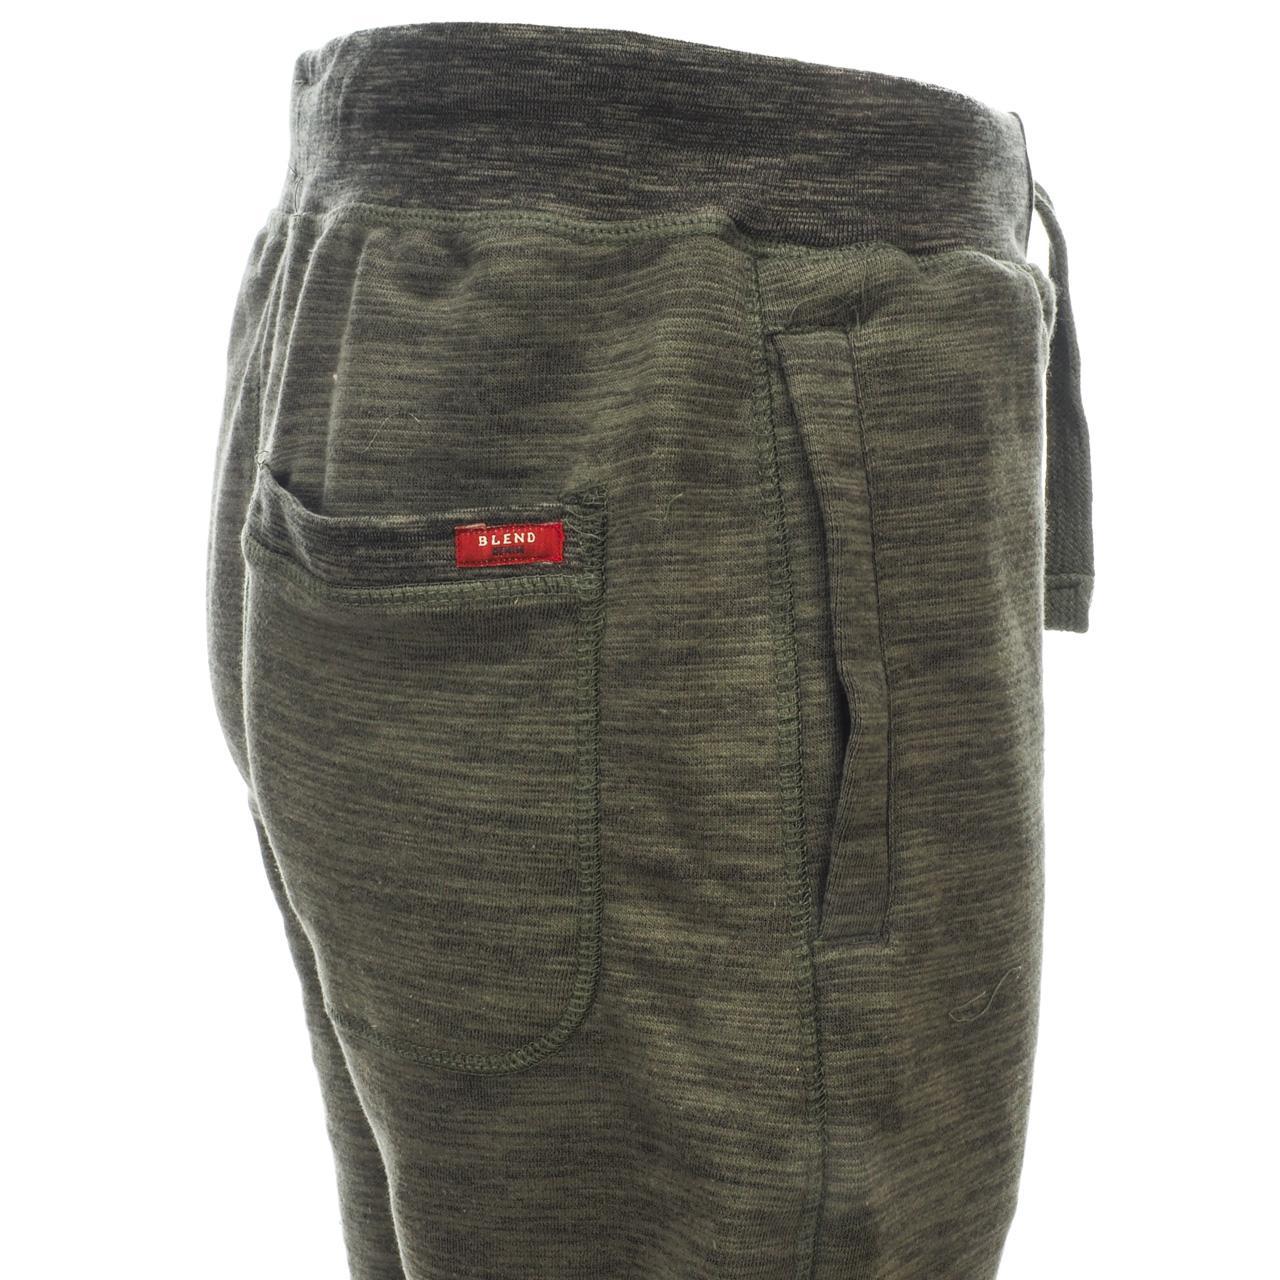 Bermuda-Shorts-Blend-Fadel-Khaki-Sw-Shorts-Green-18064-New